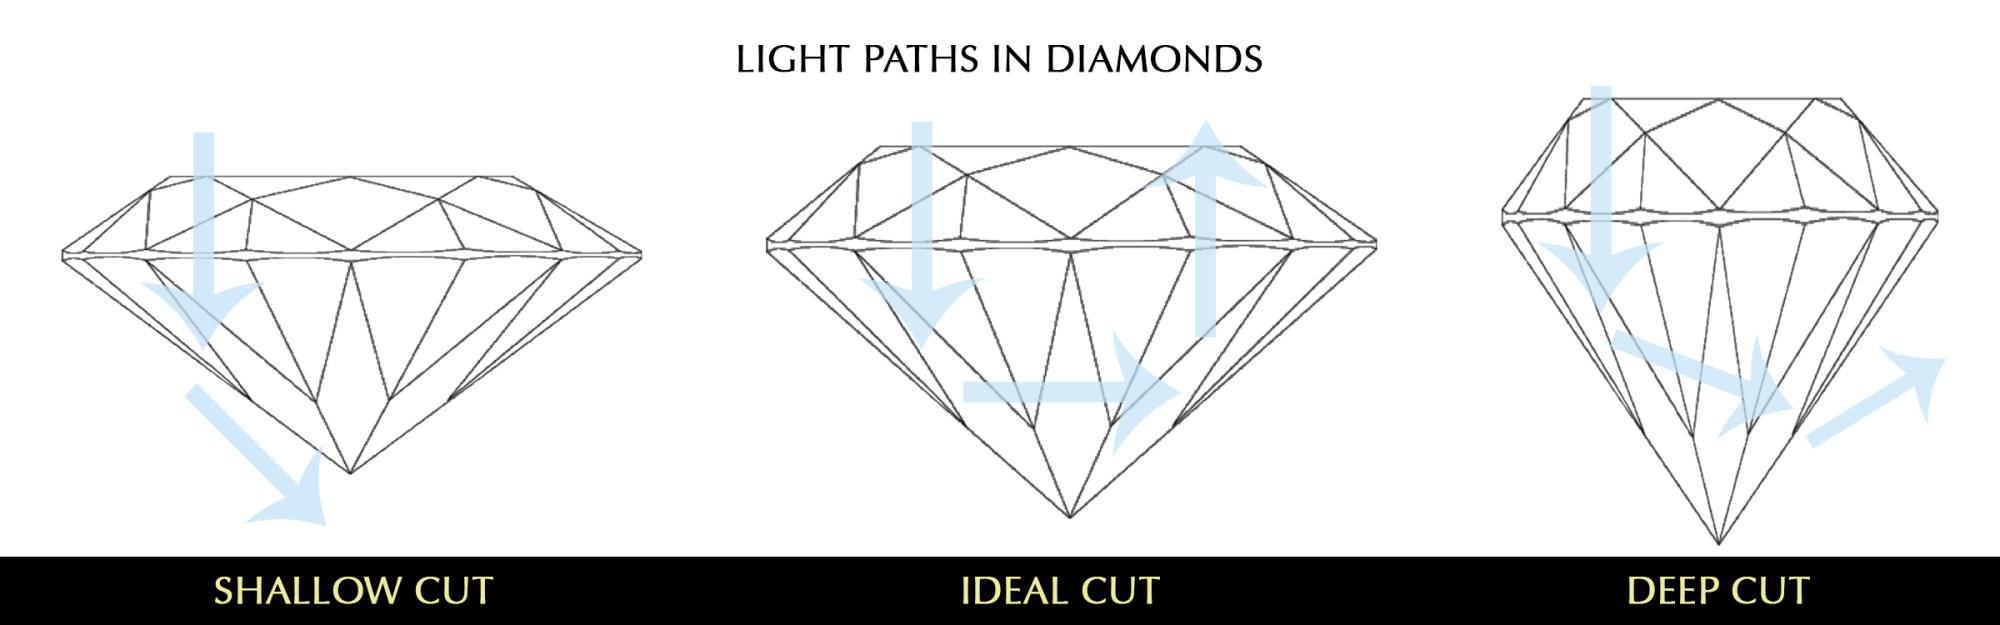 hight resolution of diamond cut